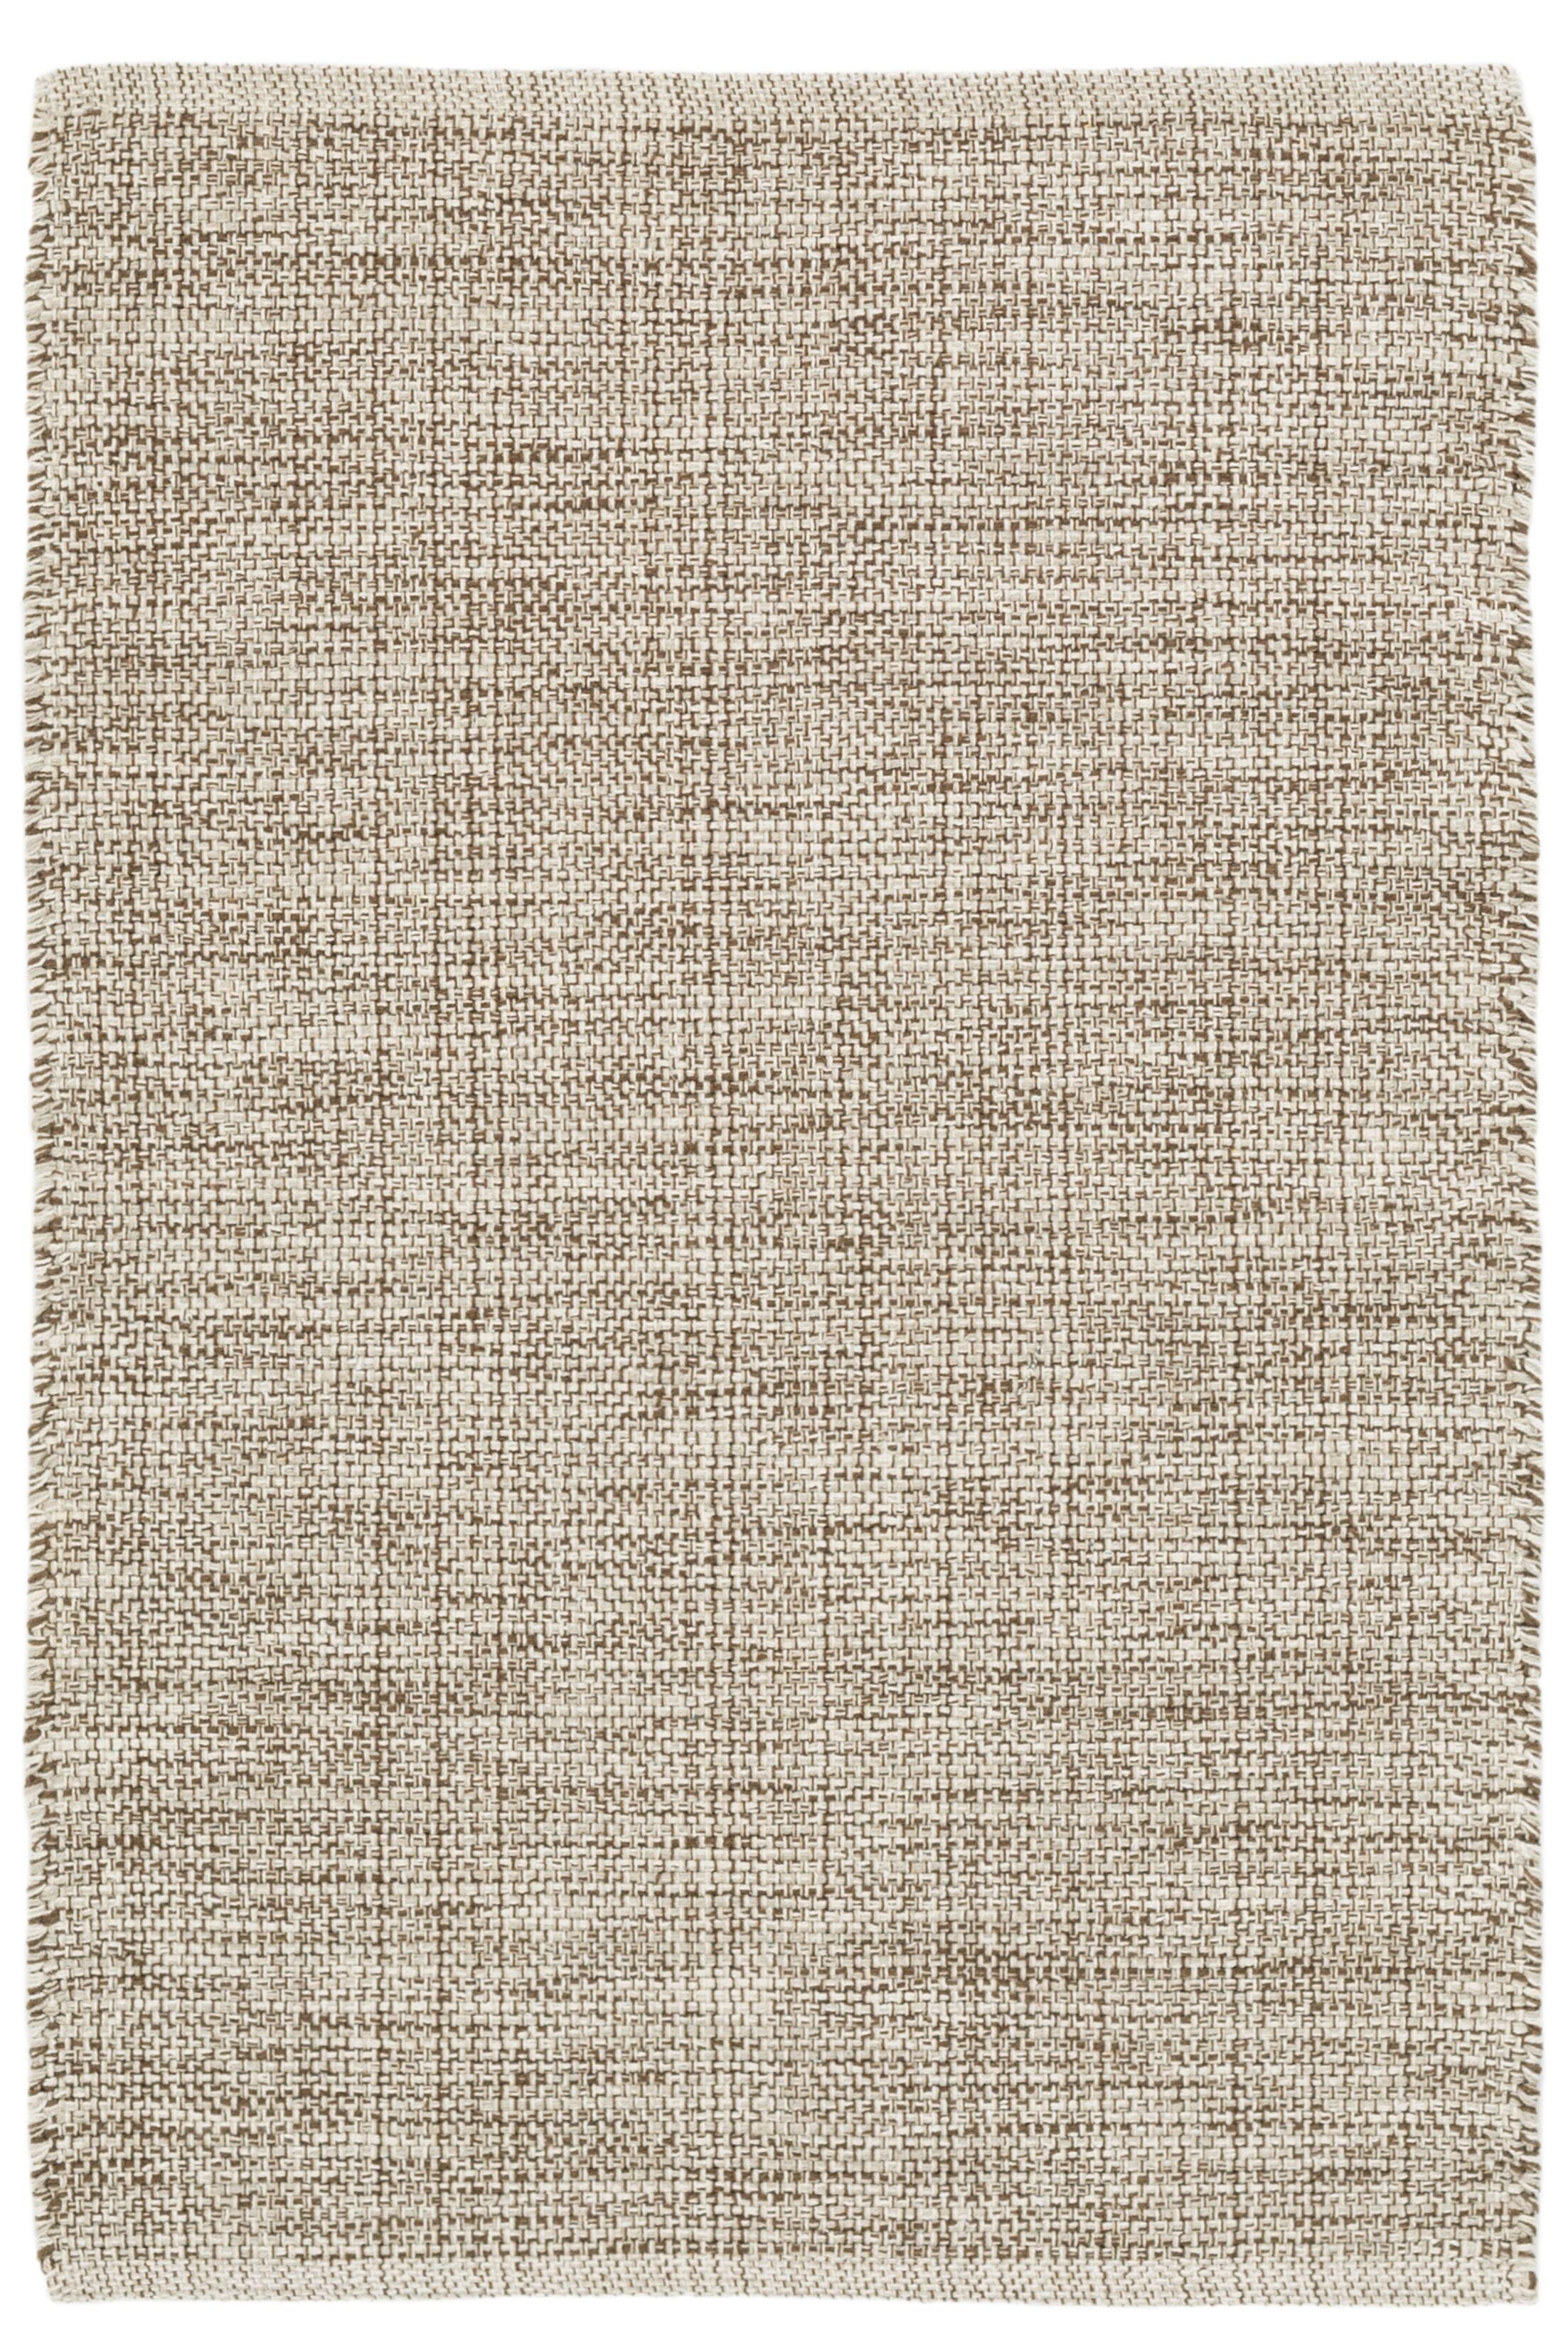 Marled Brown/Beige Area Rug Rug Size: 5' x 8'